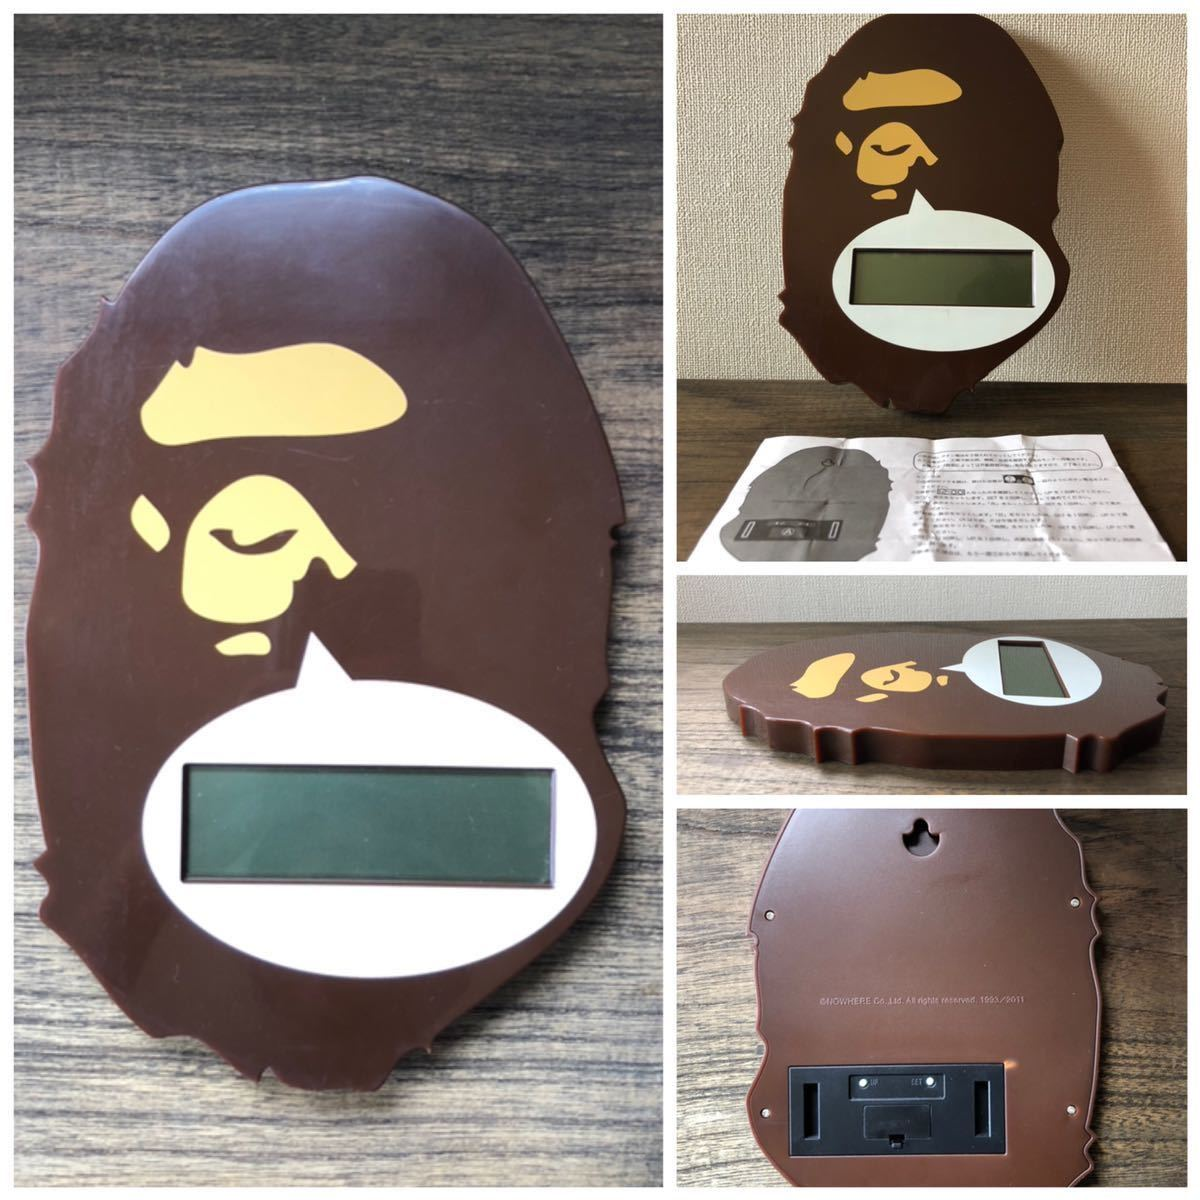 bape ウォールクロック 時計 掛け時計 bapex wall clockエイプ 非売品 nigo a bathing ap